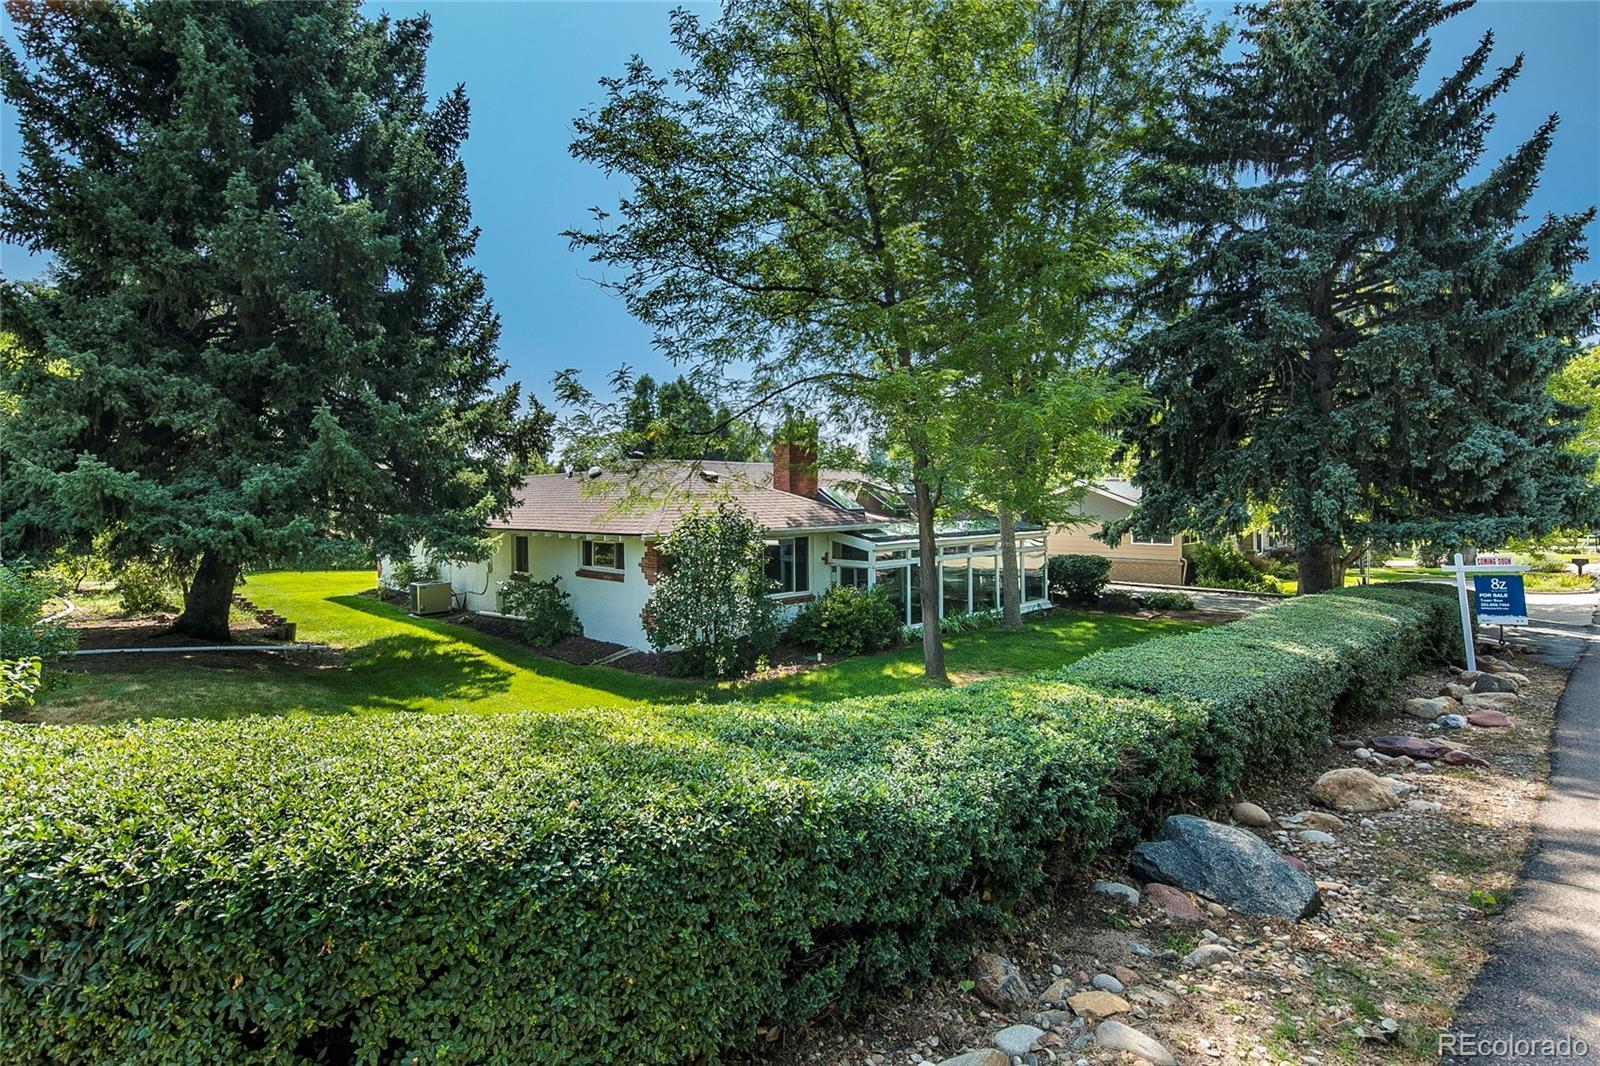 890 Vance Street, Lakewood, CO | MLS# 5378893 | Ron & Matt